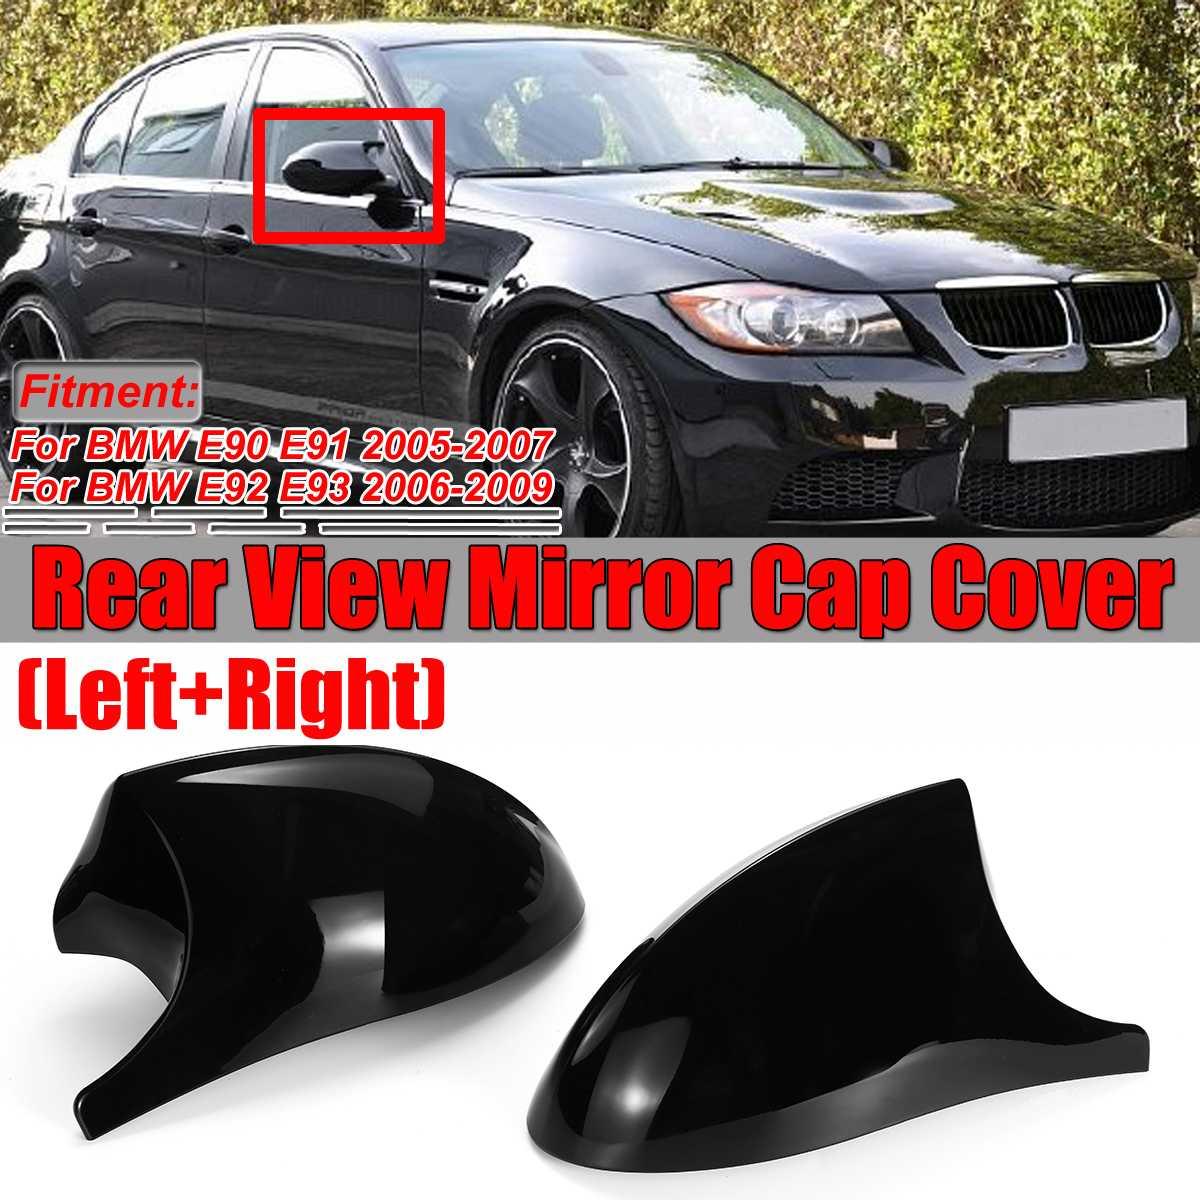 2x 진짜 탄소 섬유/ABS 미러 커버 E90 자동차 사이드 Rearview 사이드 미러 커버 모자 BMW E90 E91 E92 E93 M3 스타일 E80 E81 E87